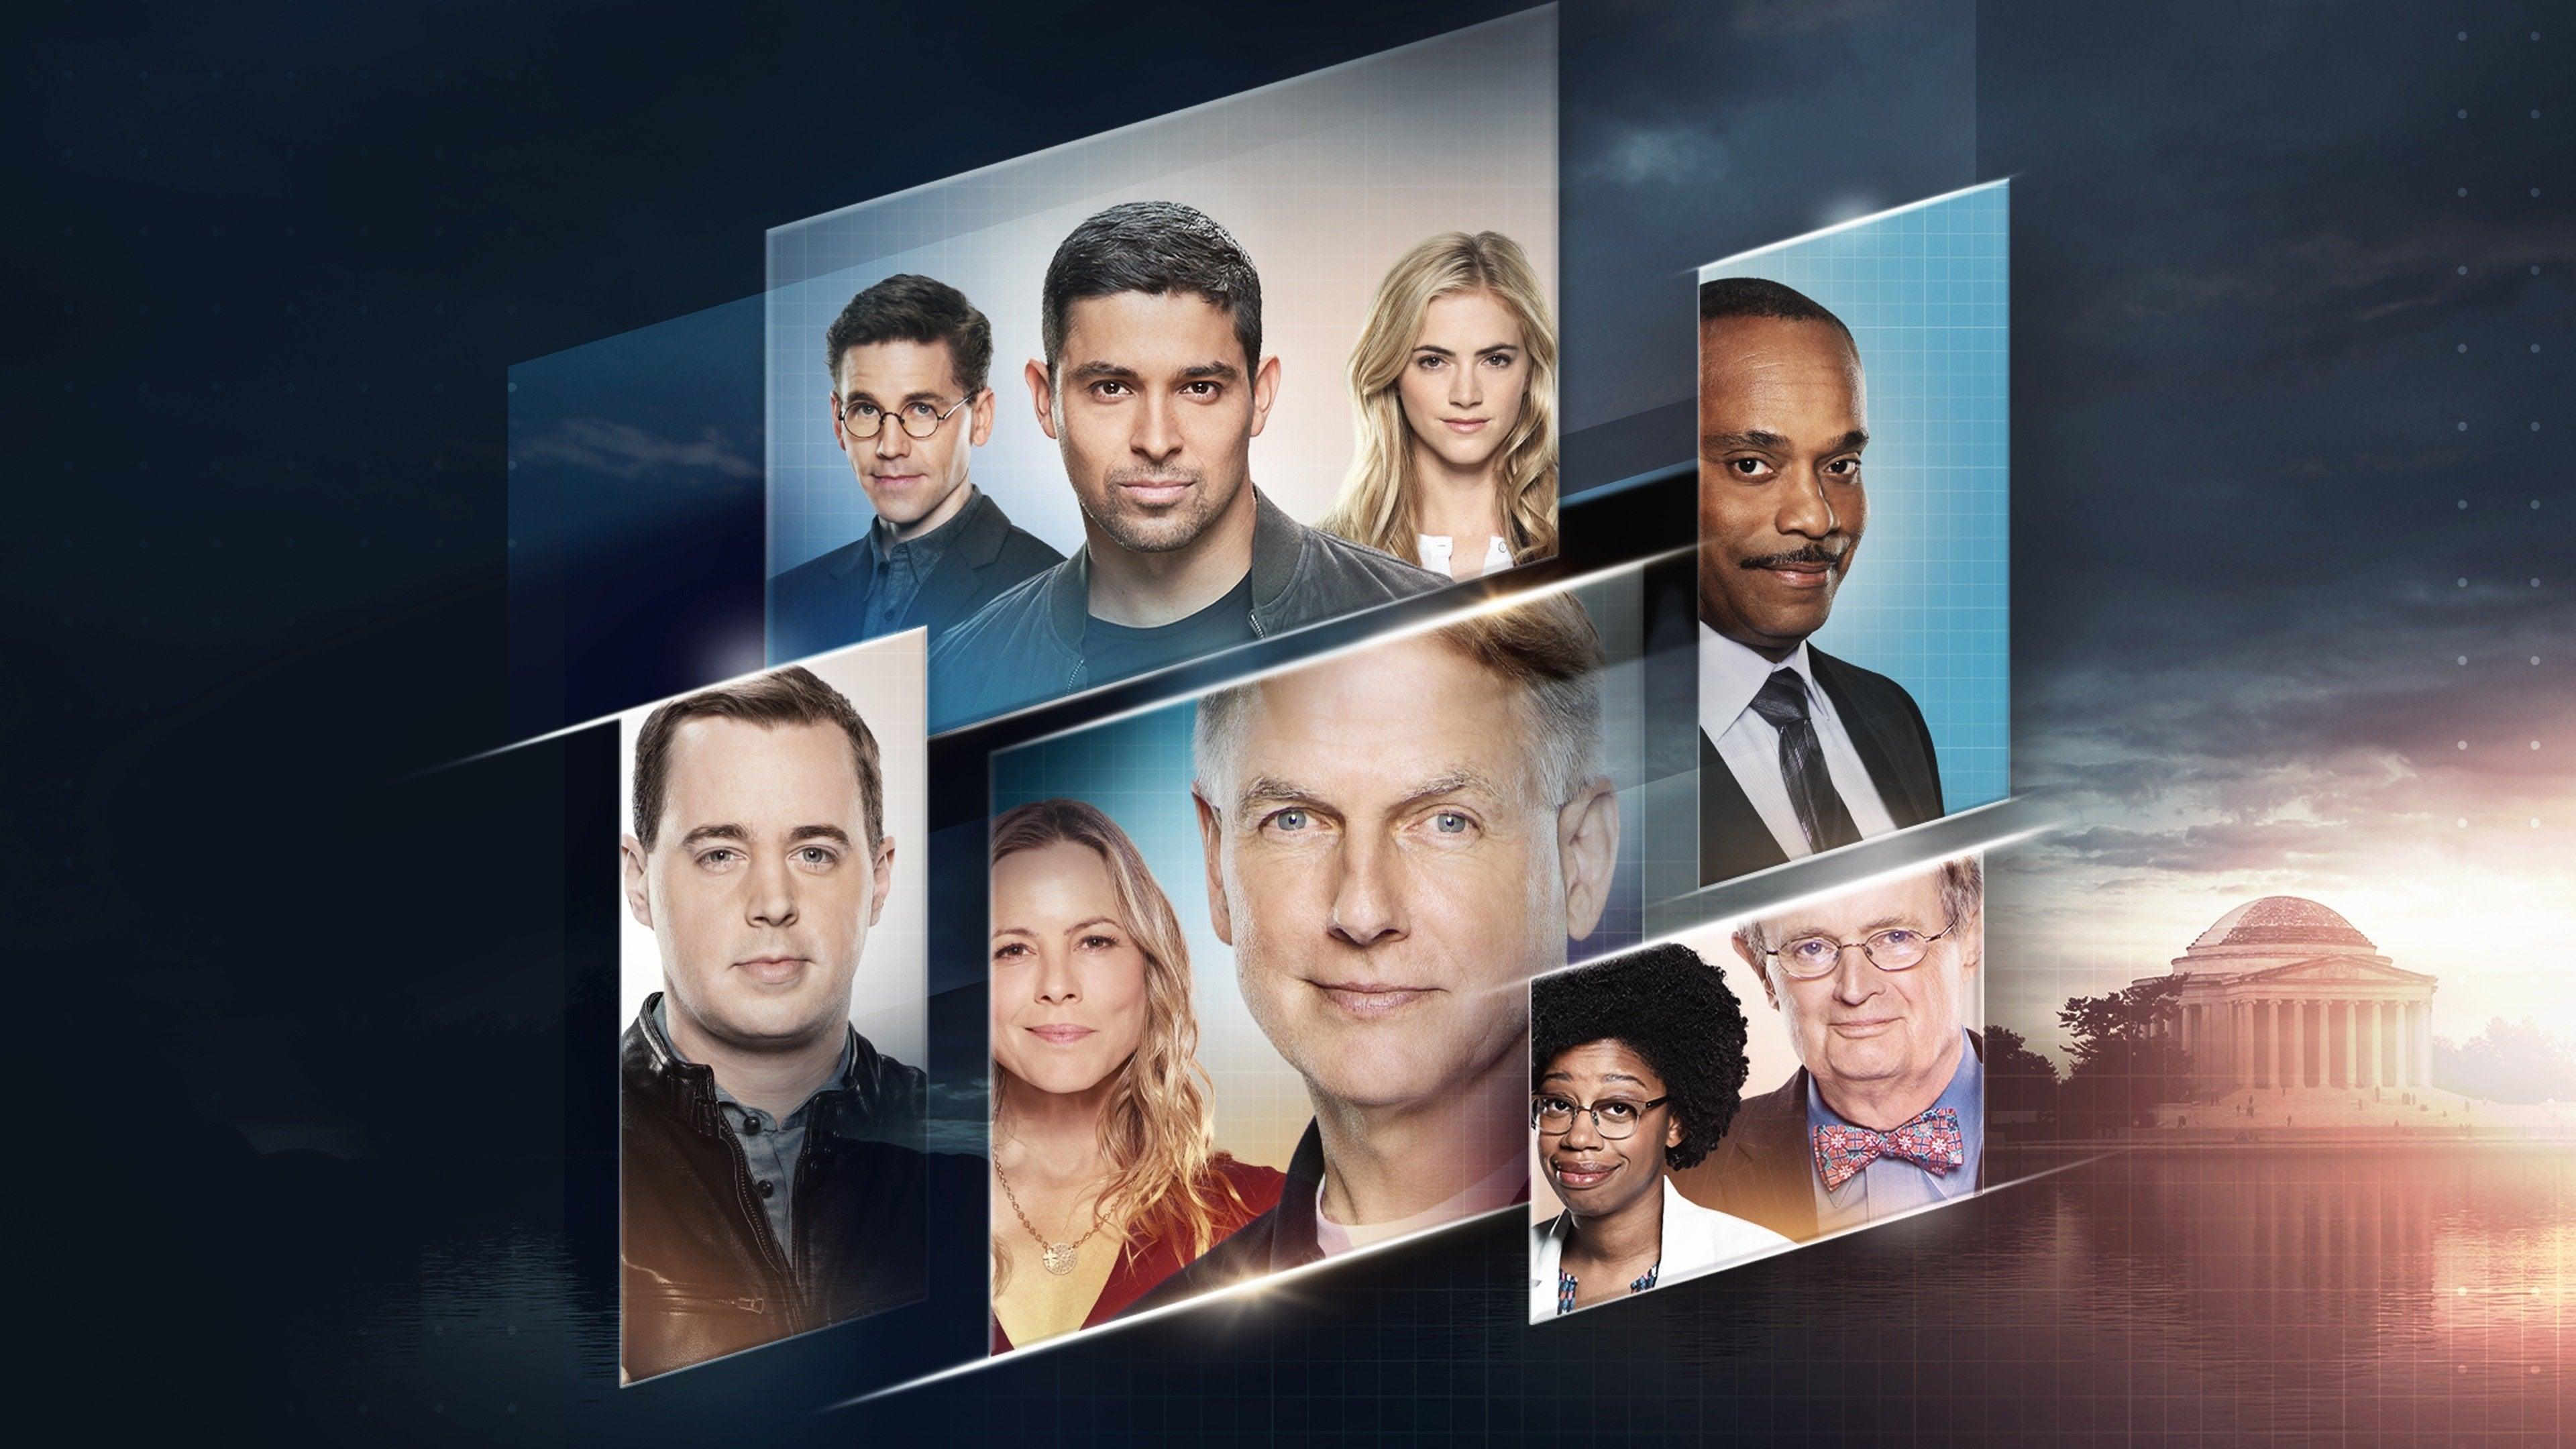 NCIS - Season 0 Episode 22 : NCIS: Season of Change